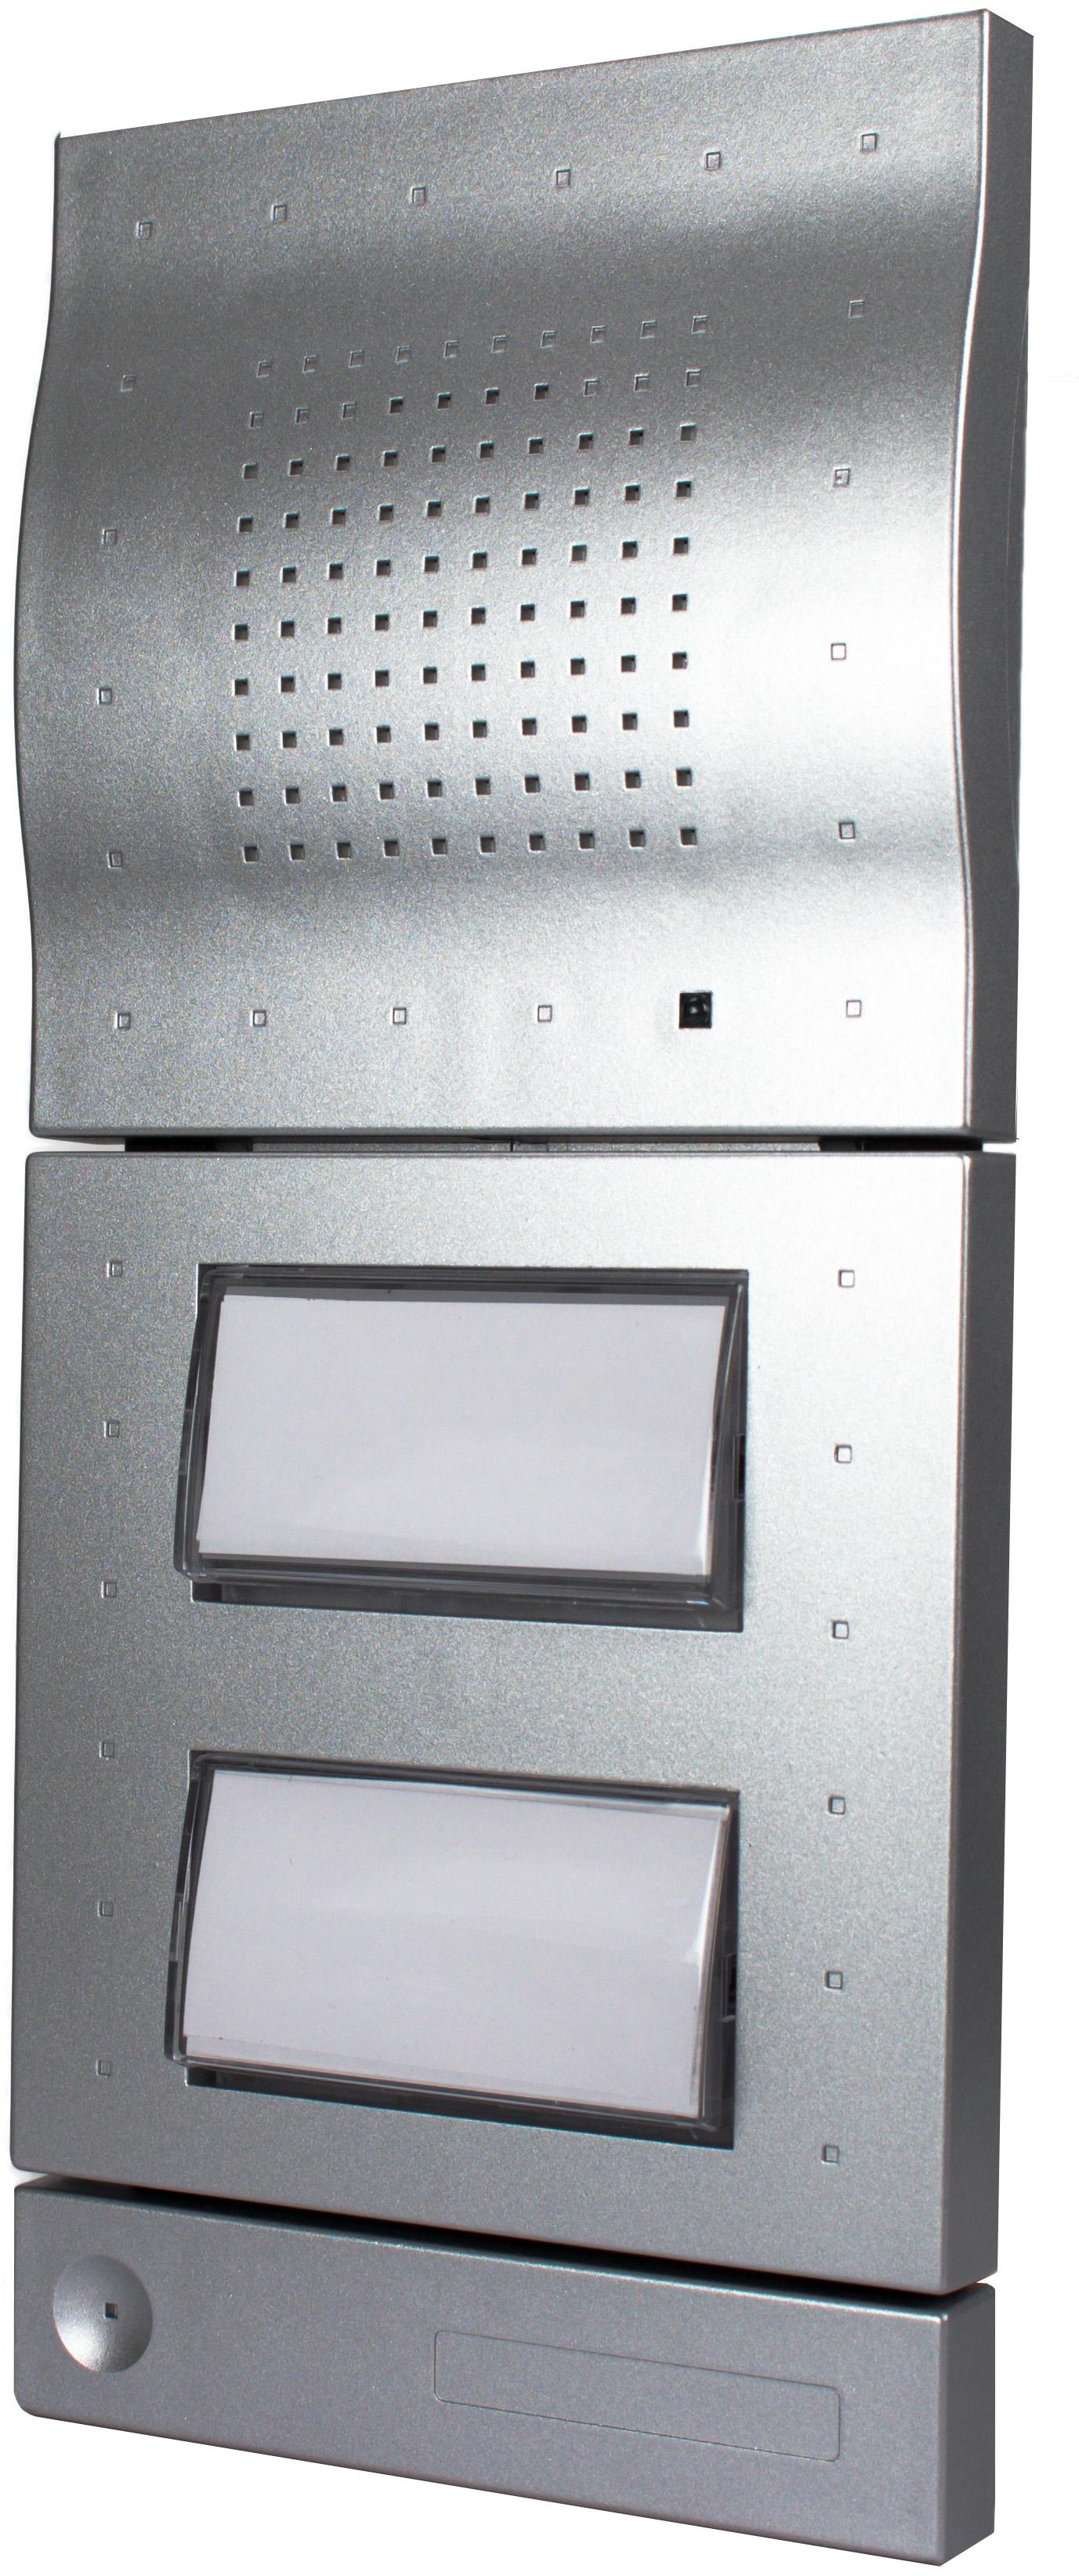 teleg rtner doorline classic a b t01 t02 t rsprechanlage f r fritzbox speedport. Black Bedroom Furniture Sets. Home Design Ideas